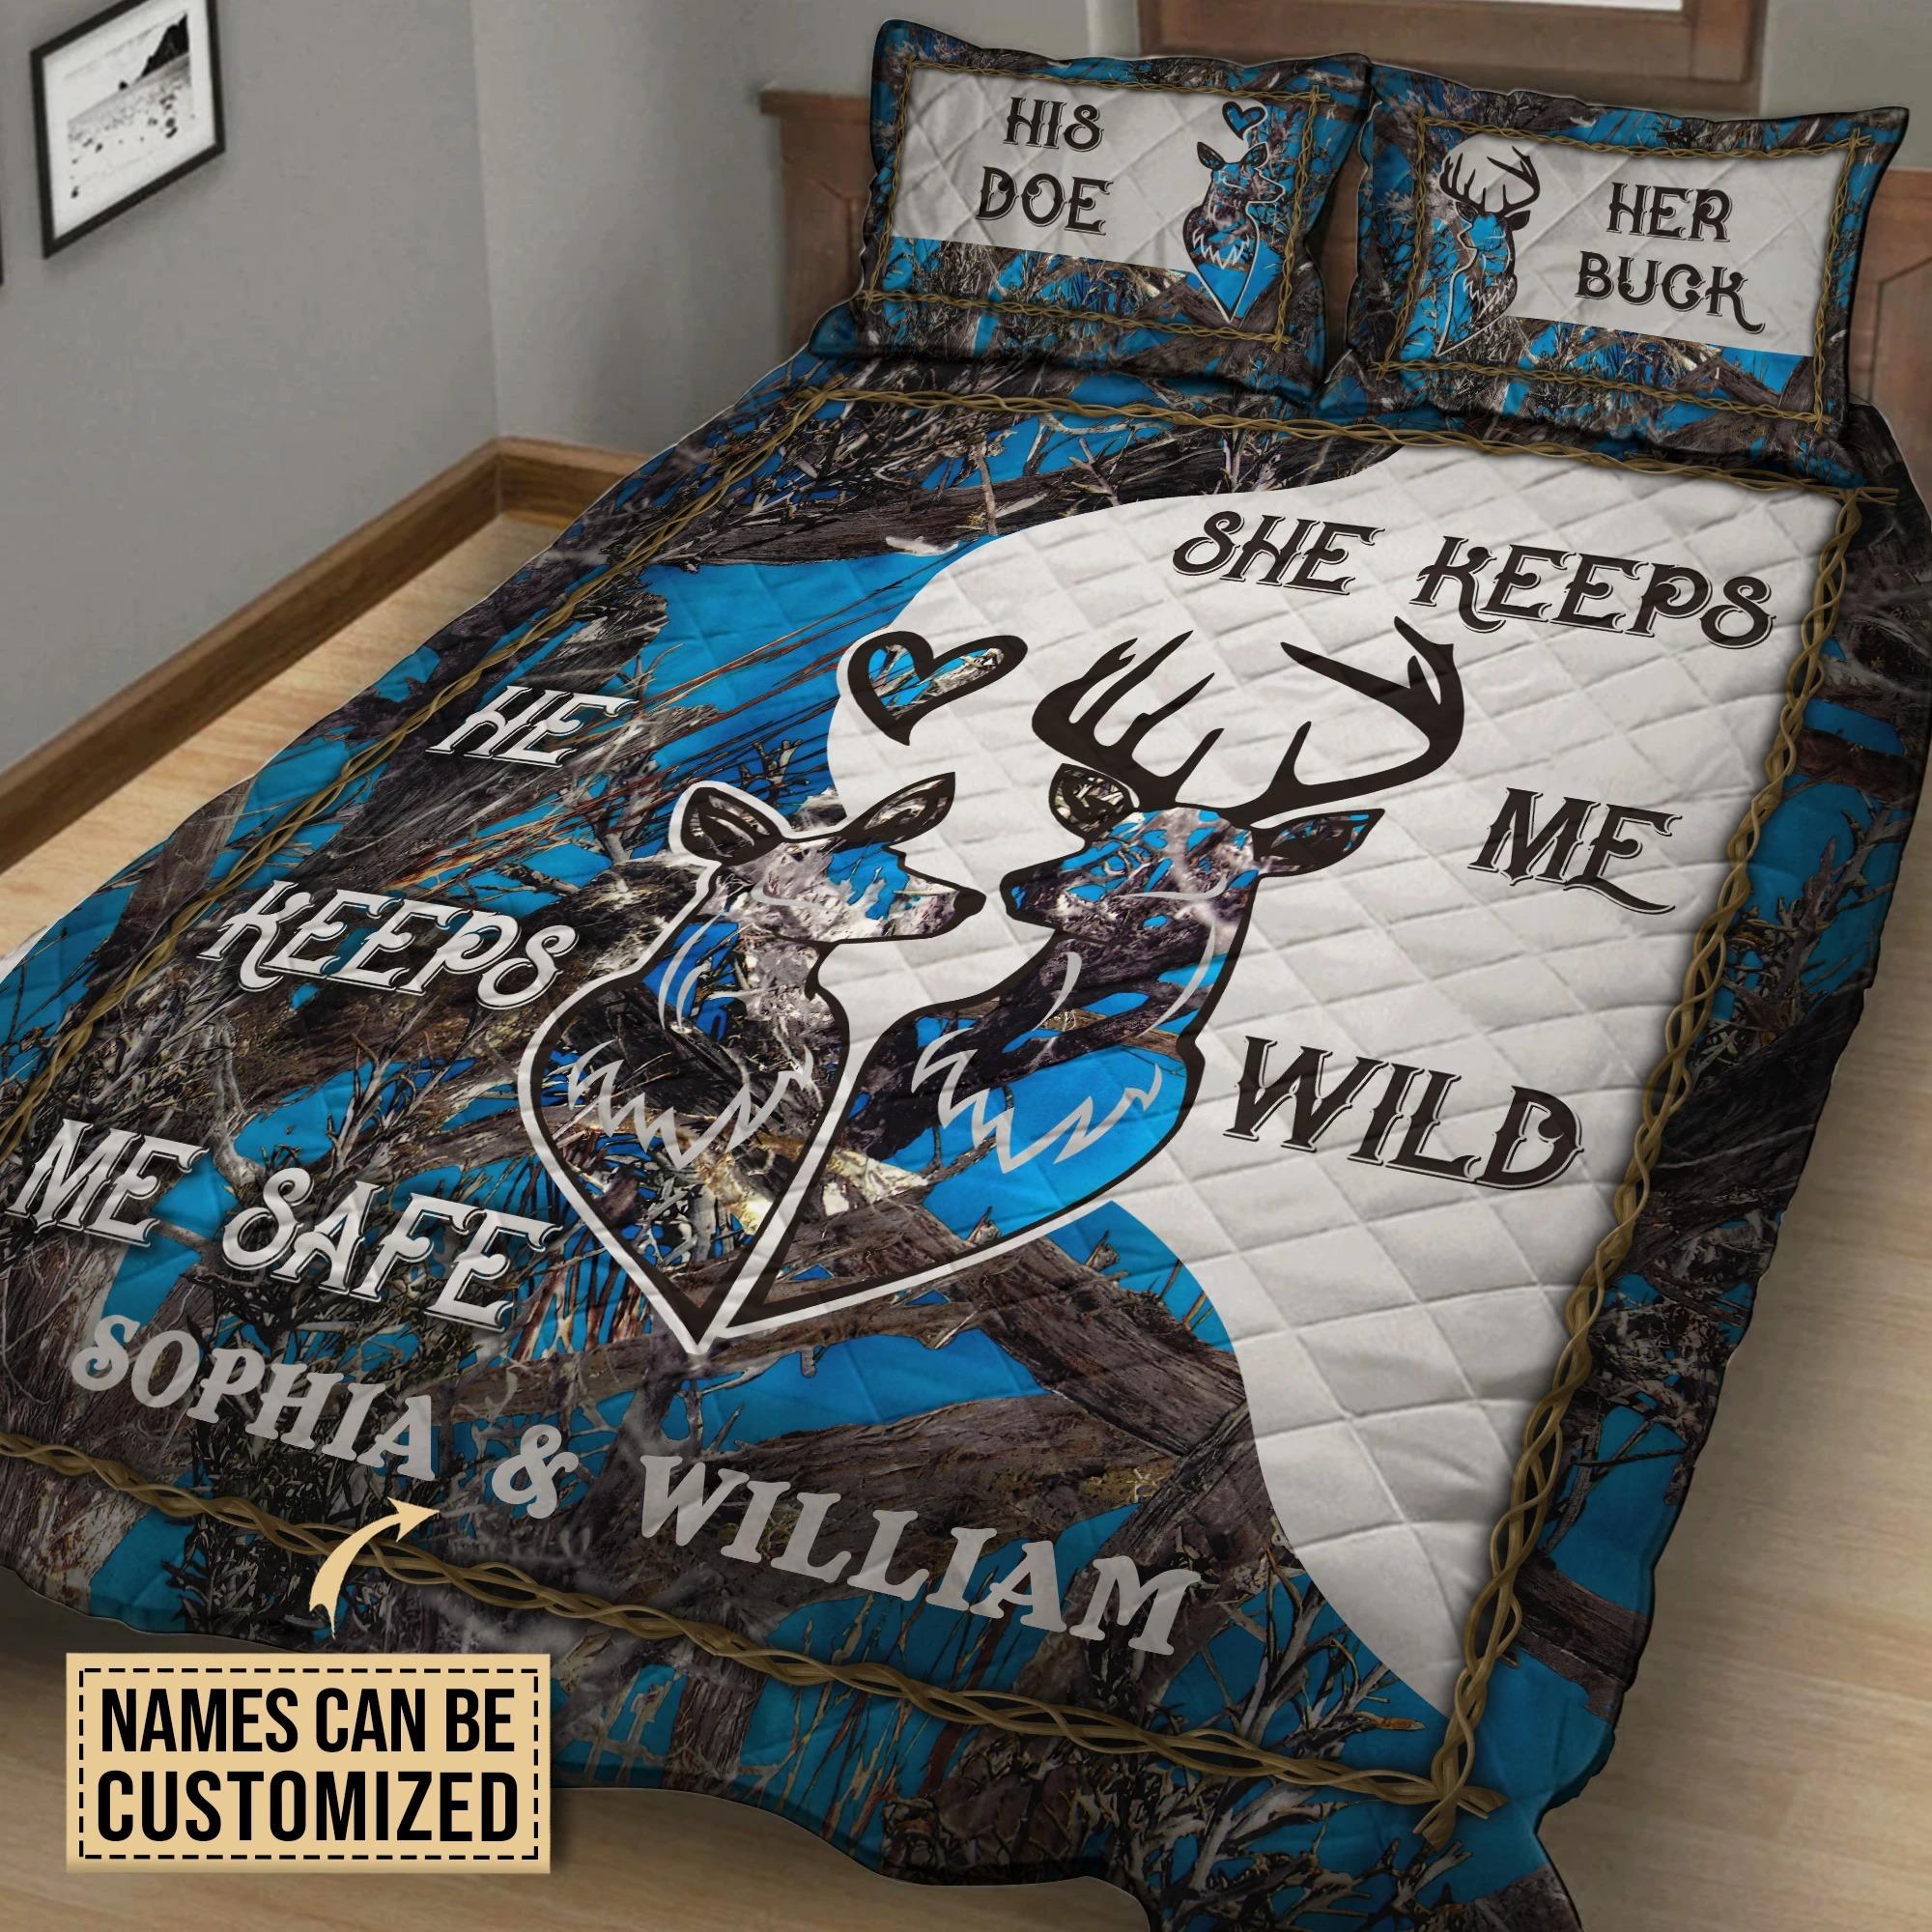 His doe her buck she keep me wild he keeps me safe custom name quilt bedding set2